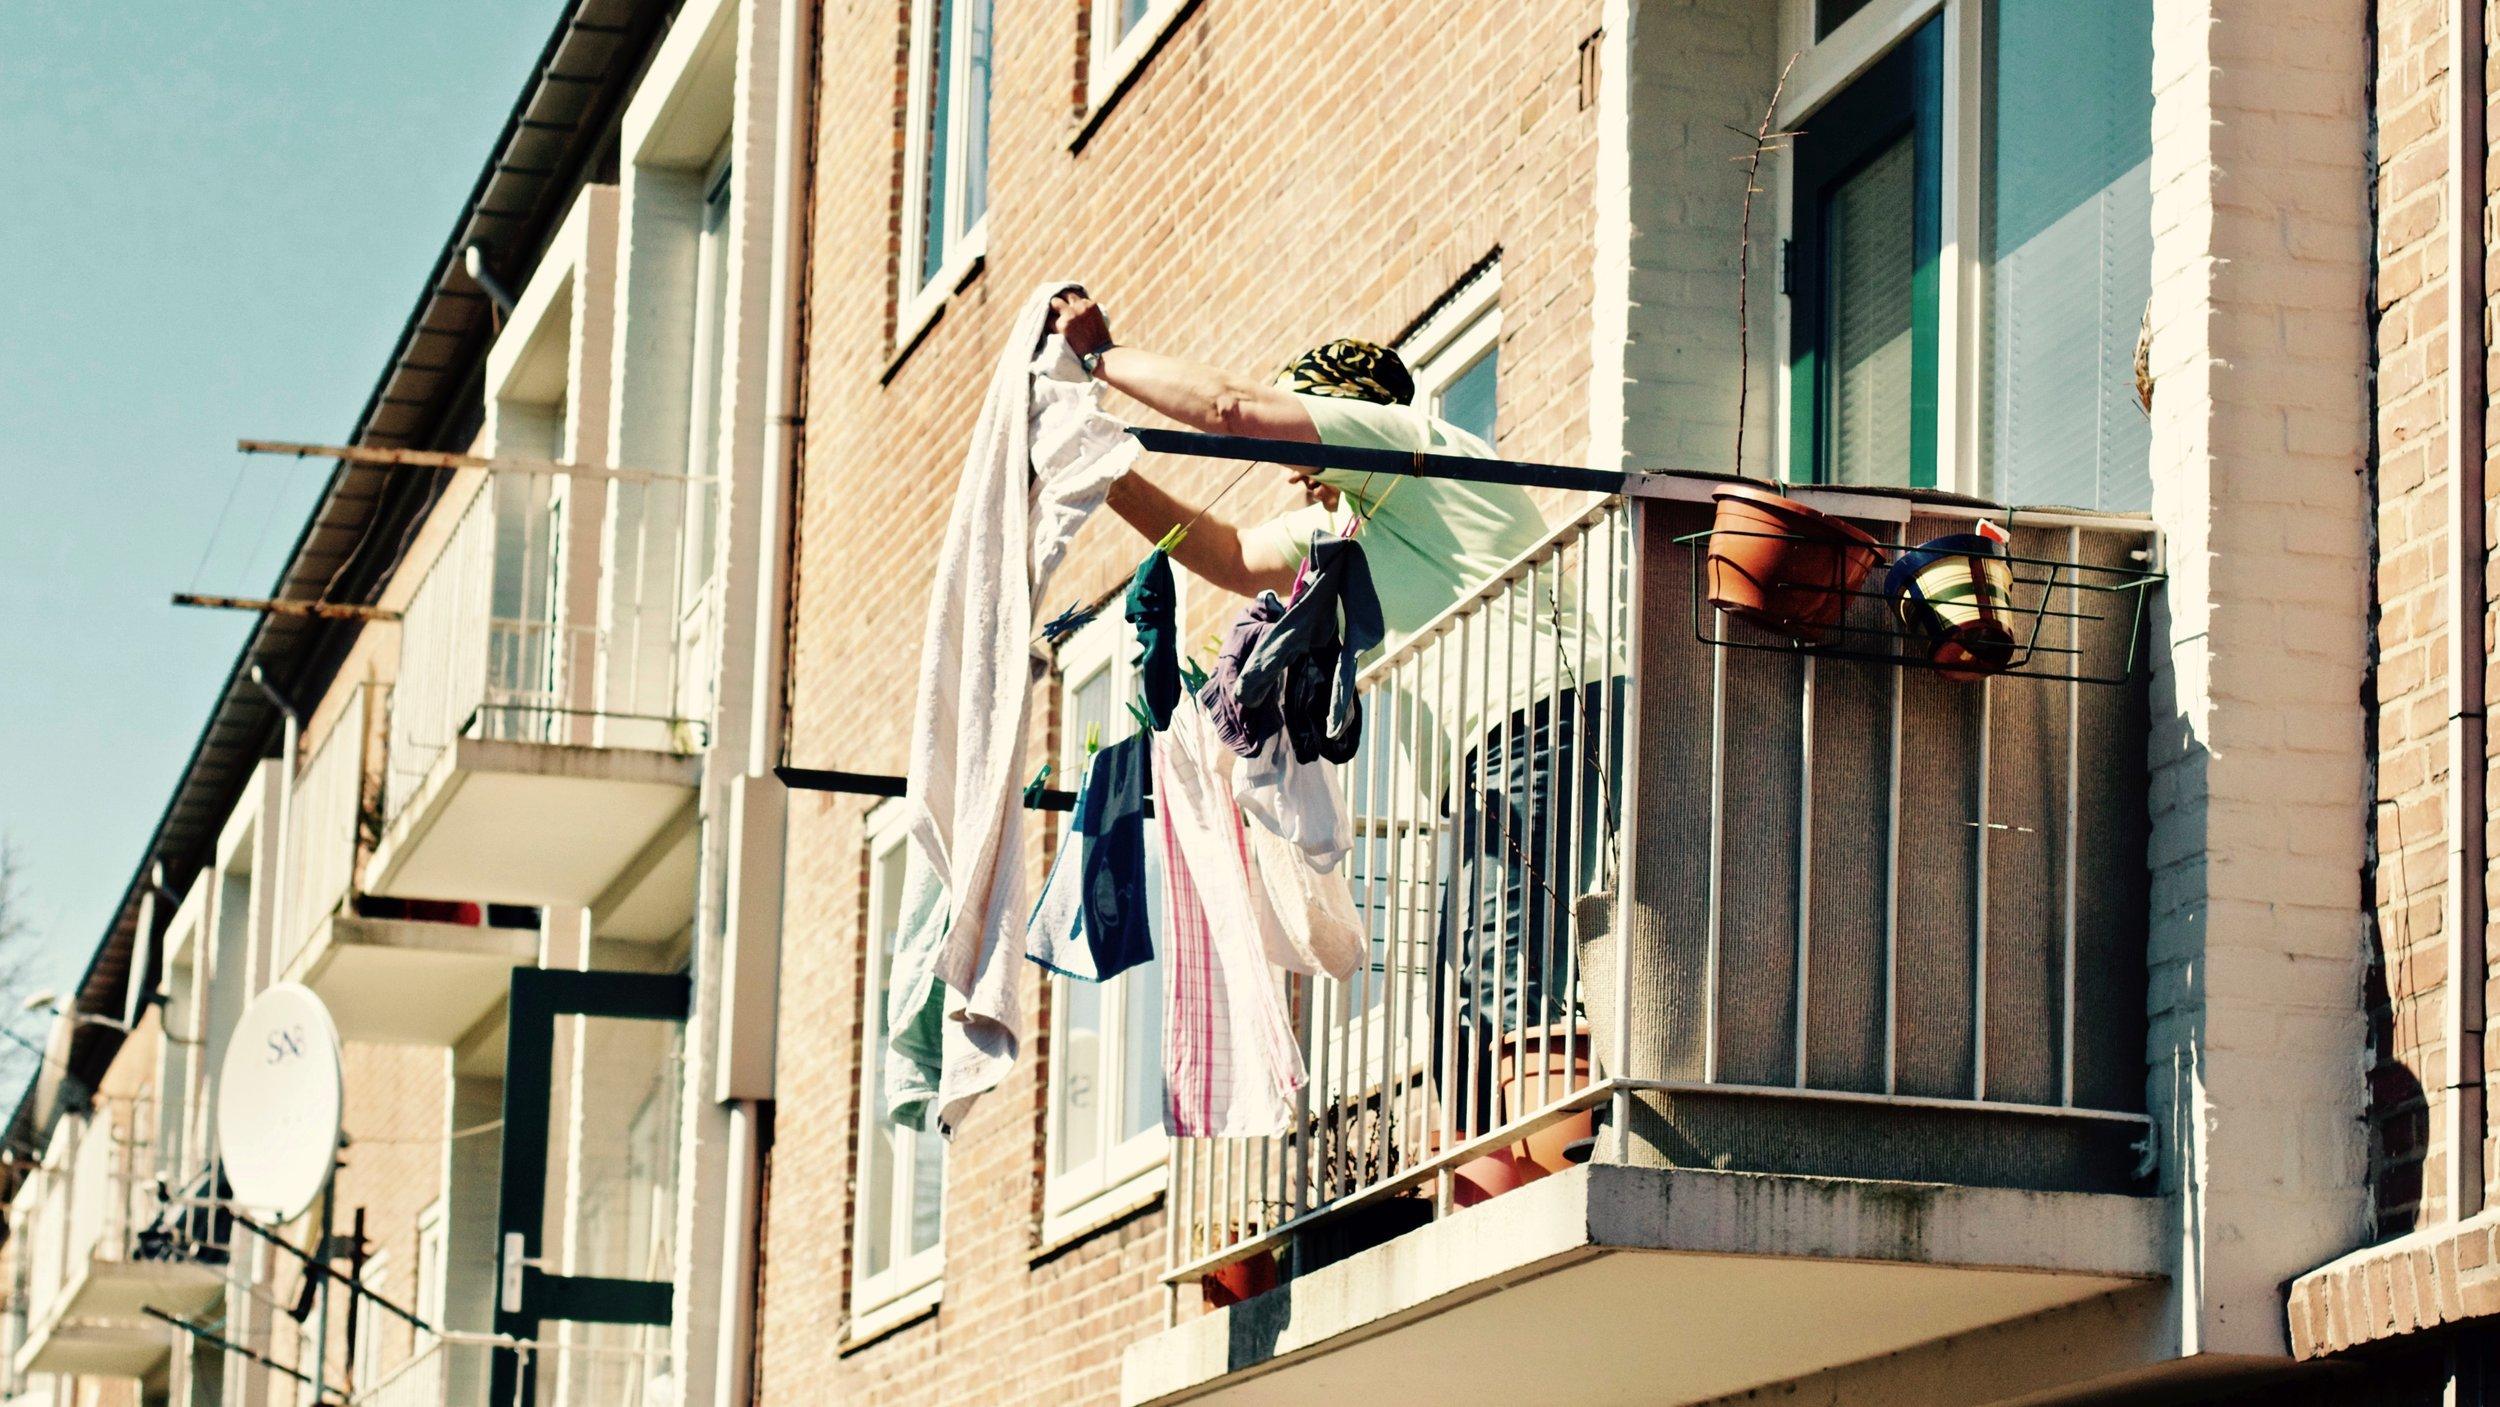 apartment-architecture-balcony-325259.jpg